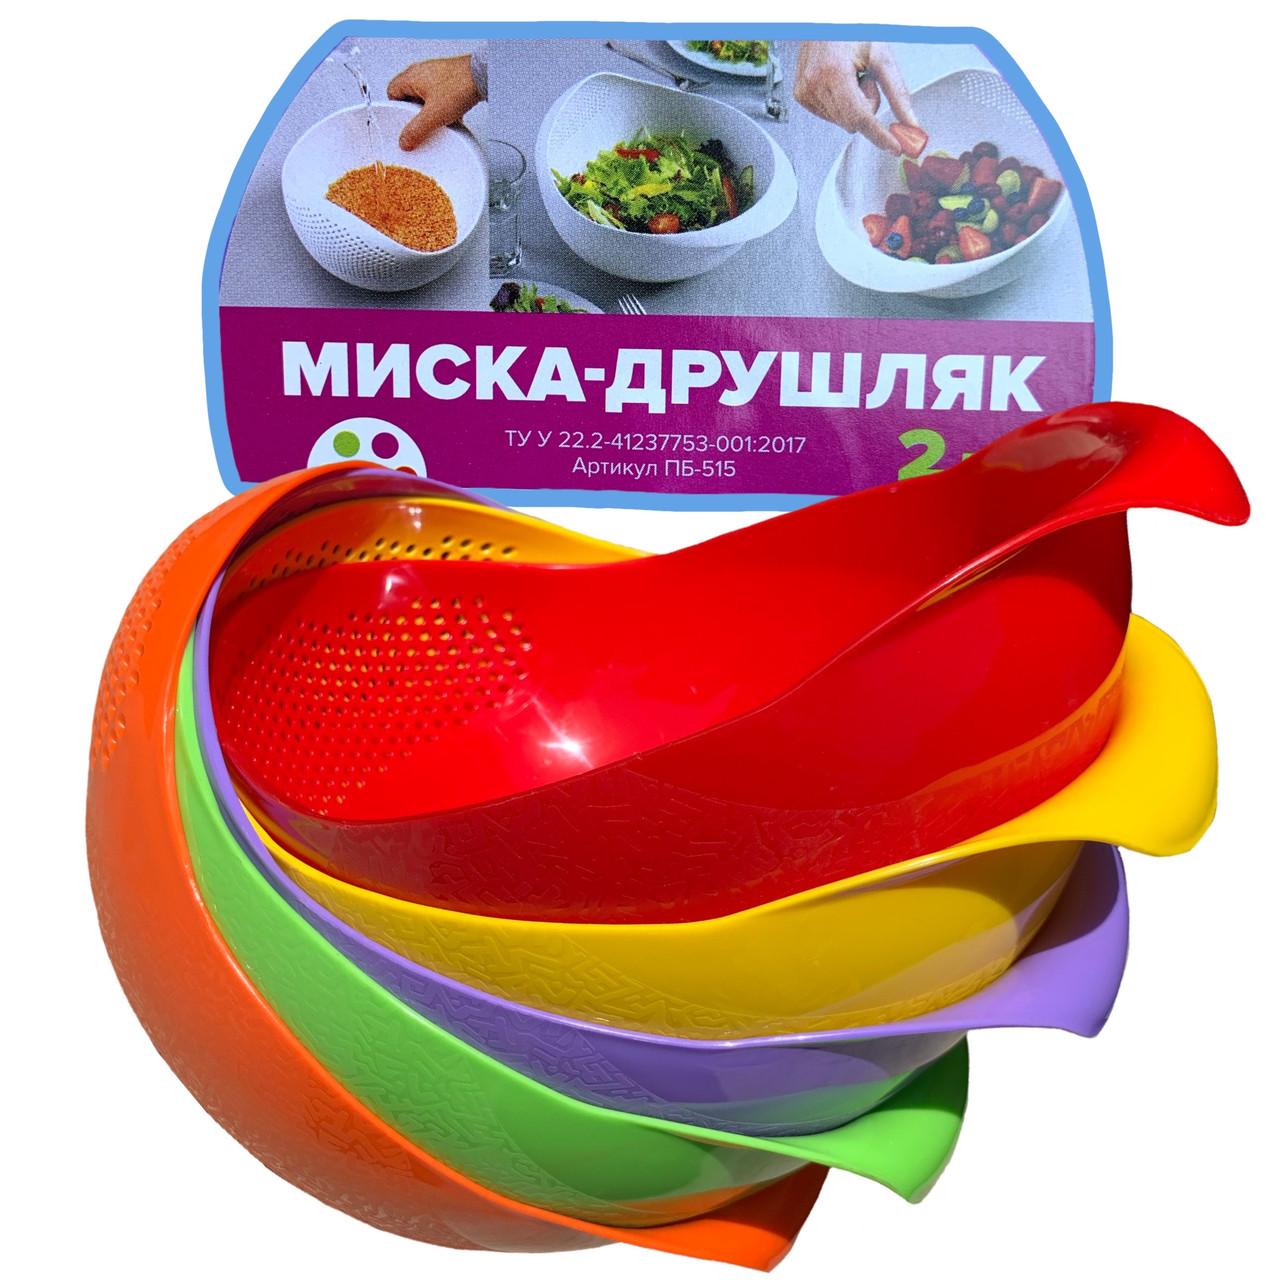 Миска-друшляк пластик 2.0л